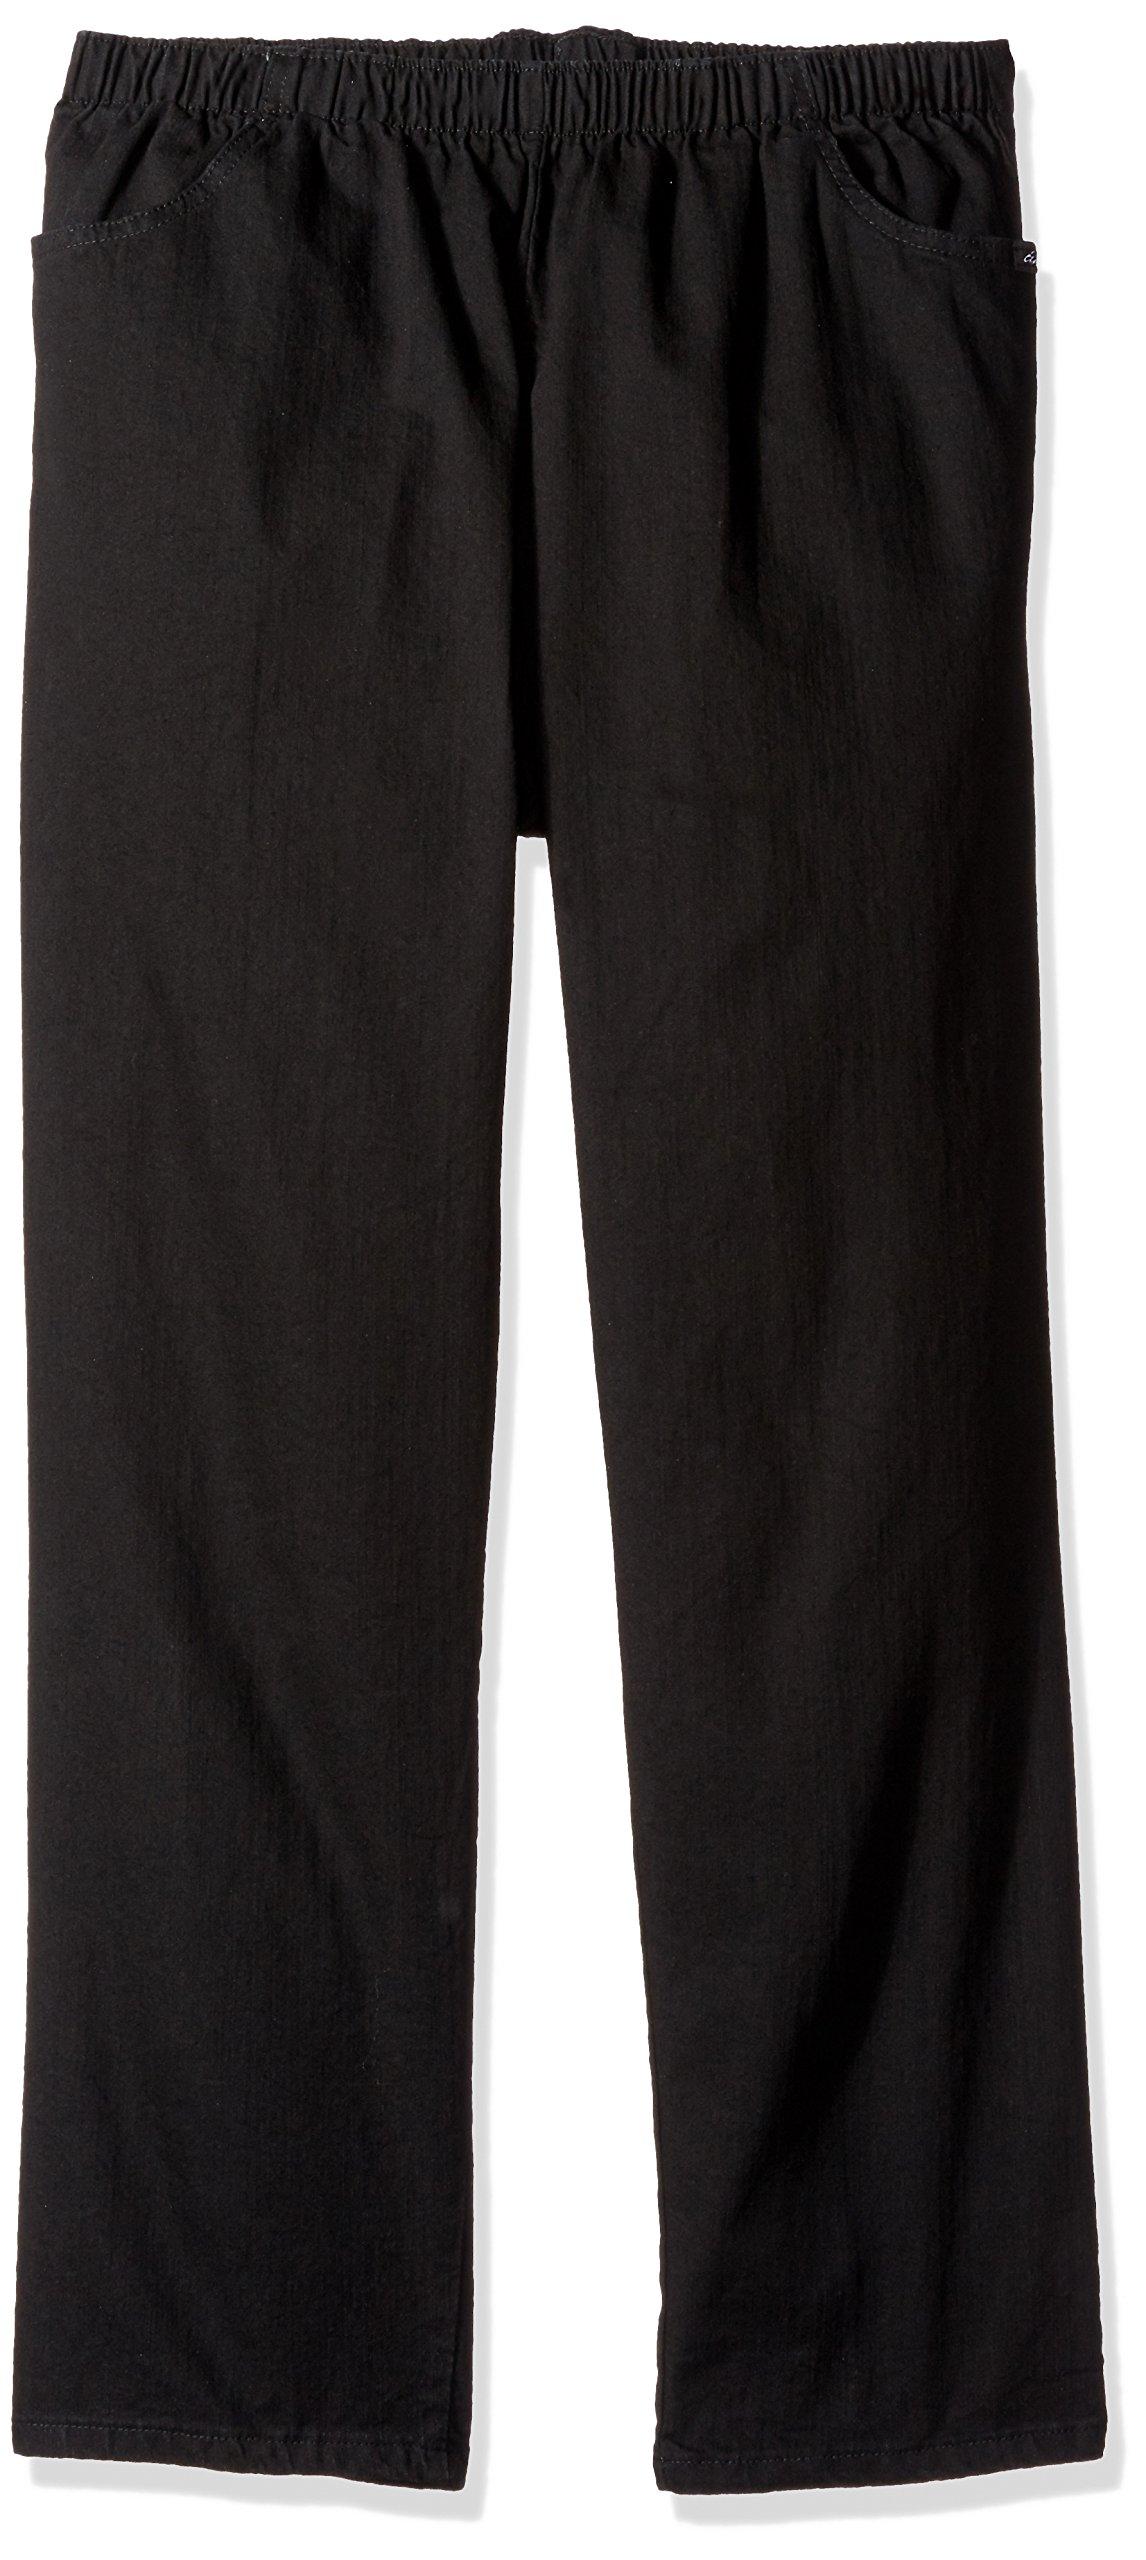 Chic Classic Collection Women's Petite Plus Cotton Pull-on Pant with Elastic Waist, Black Denim, 24P